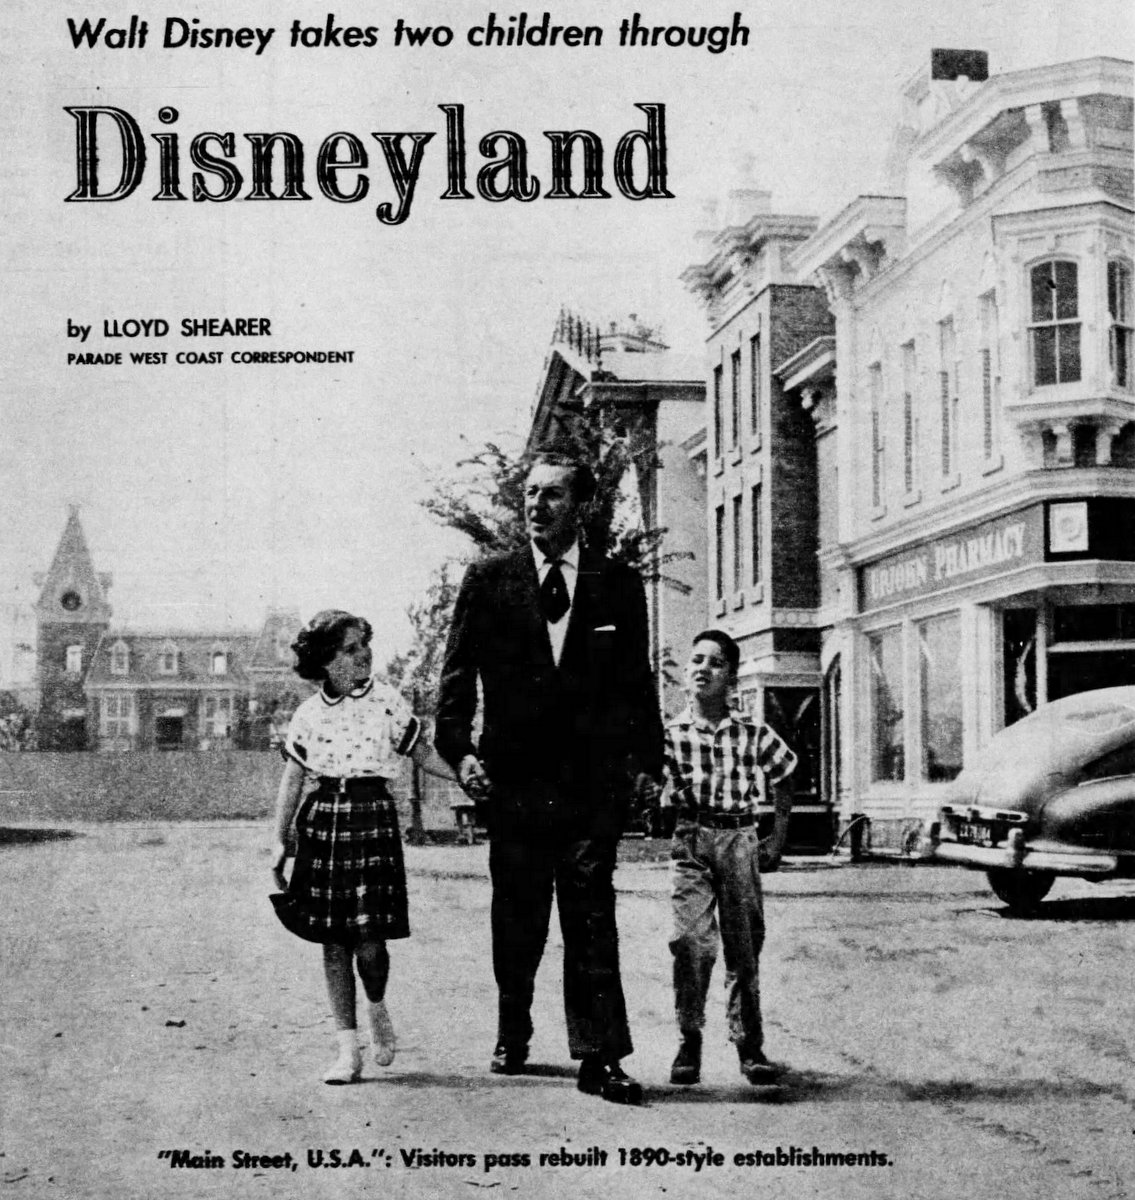 See Walt Disney gave a personal tour of Vintage Disneyland before it opened in 1955